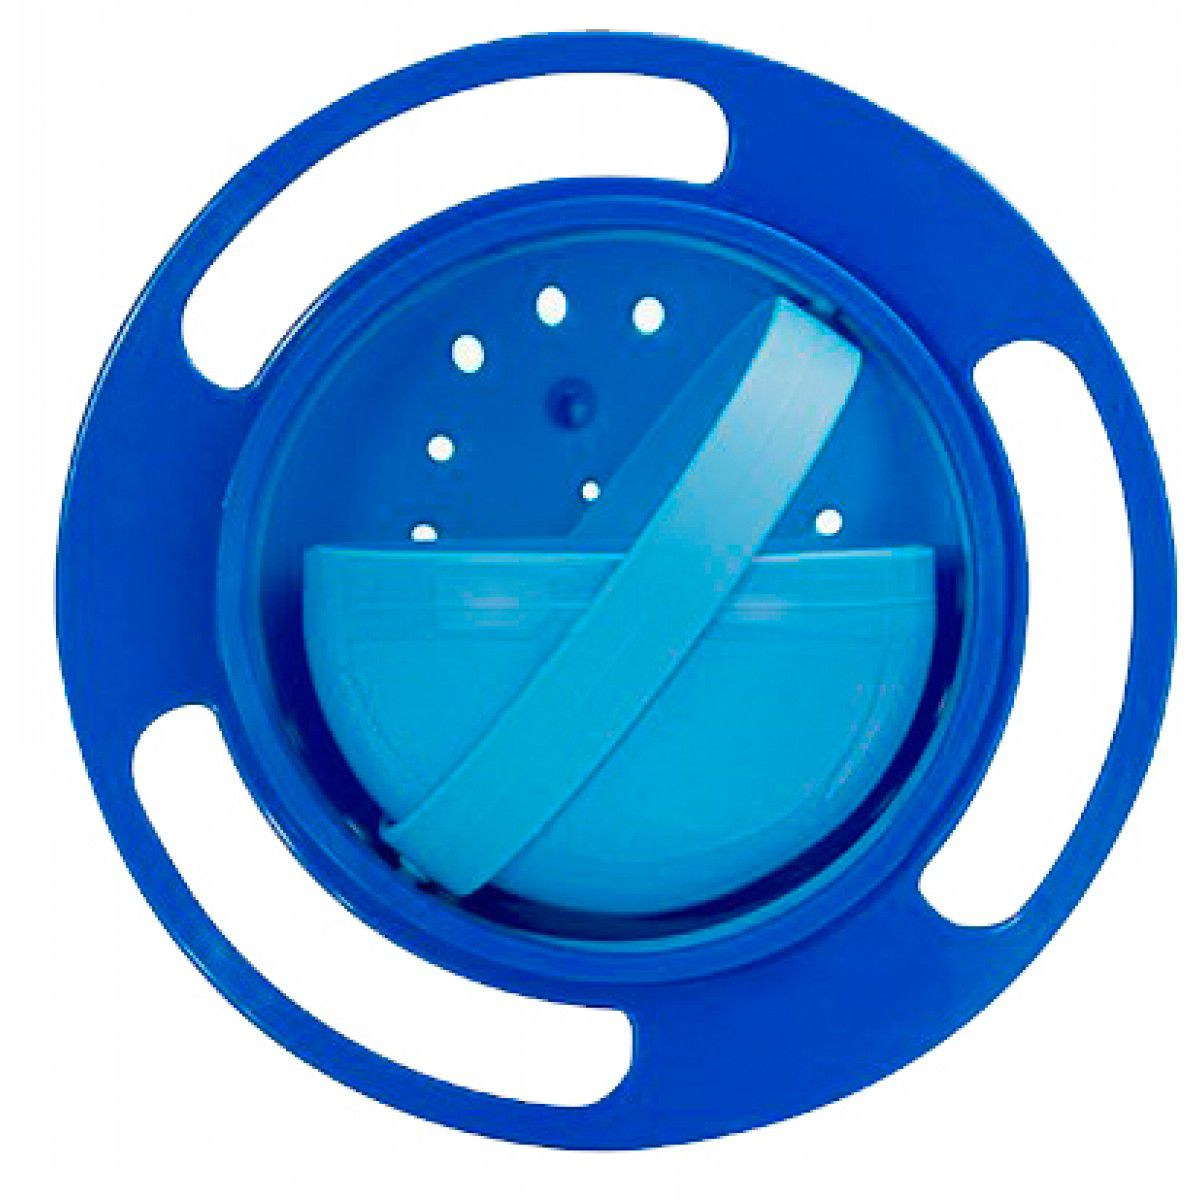 Prato Mágico Azul  10020-203/7452